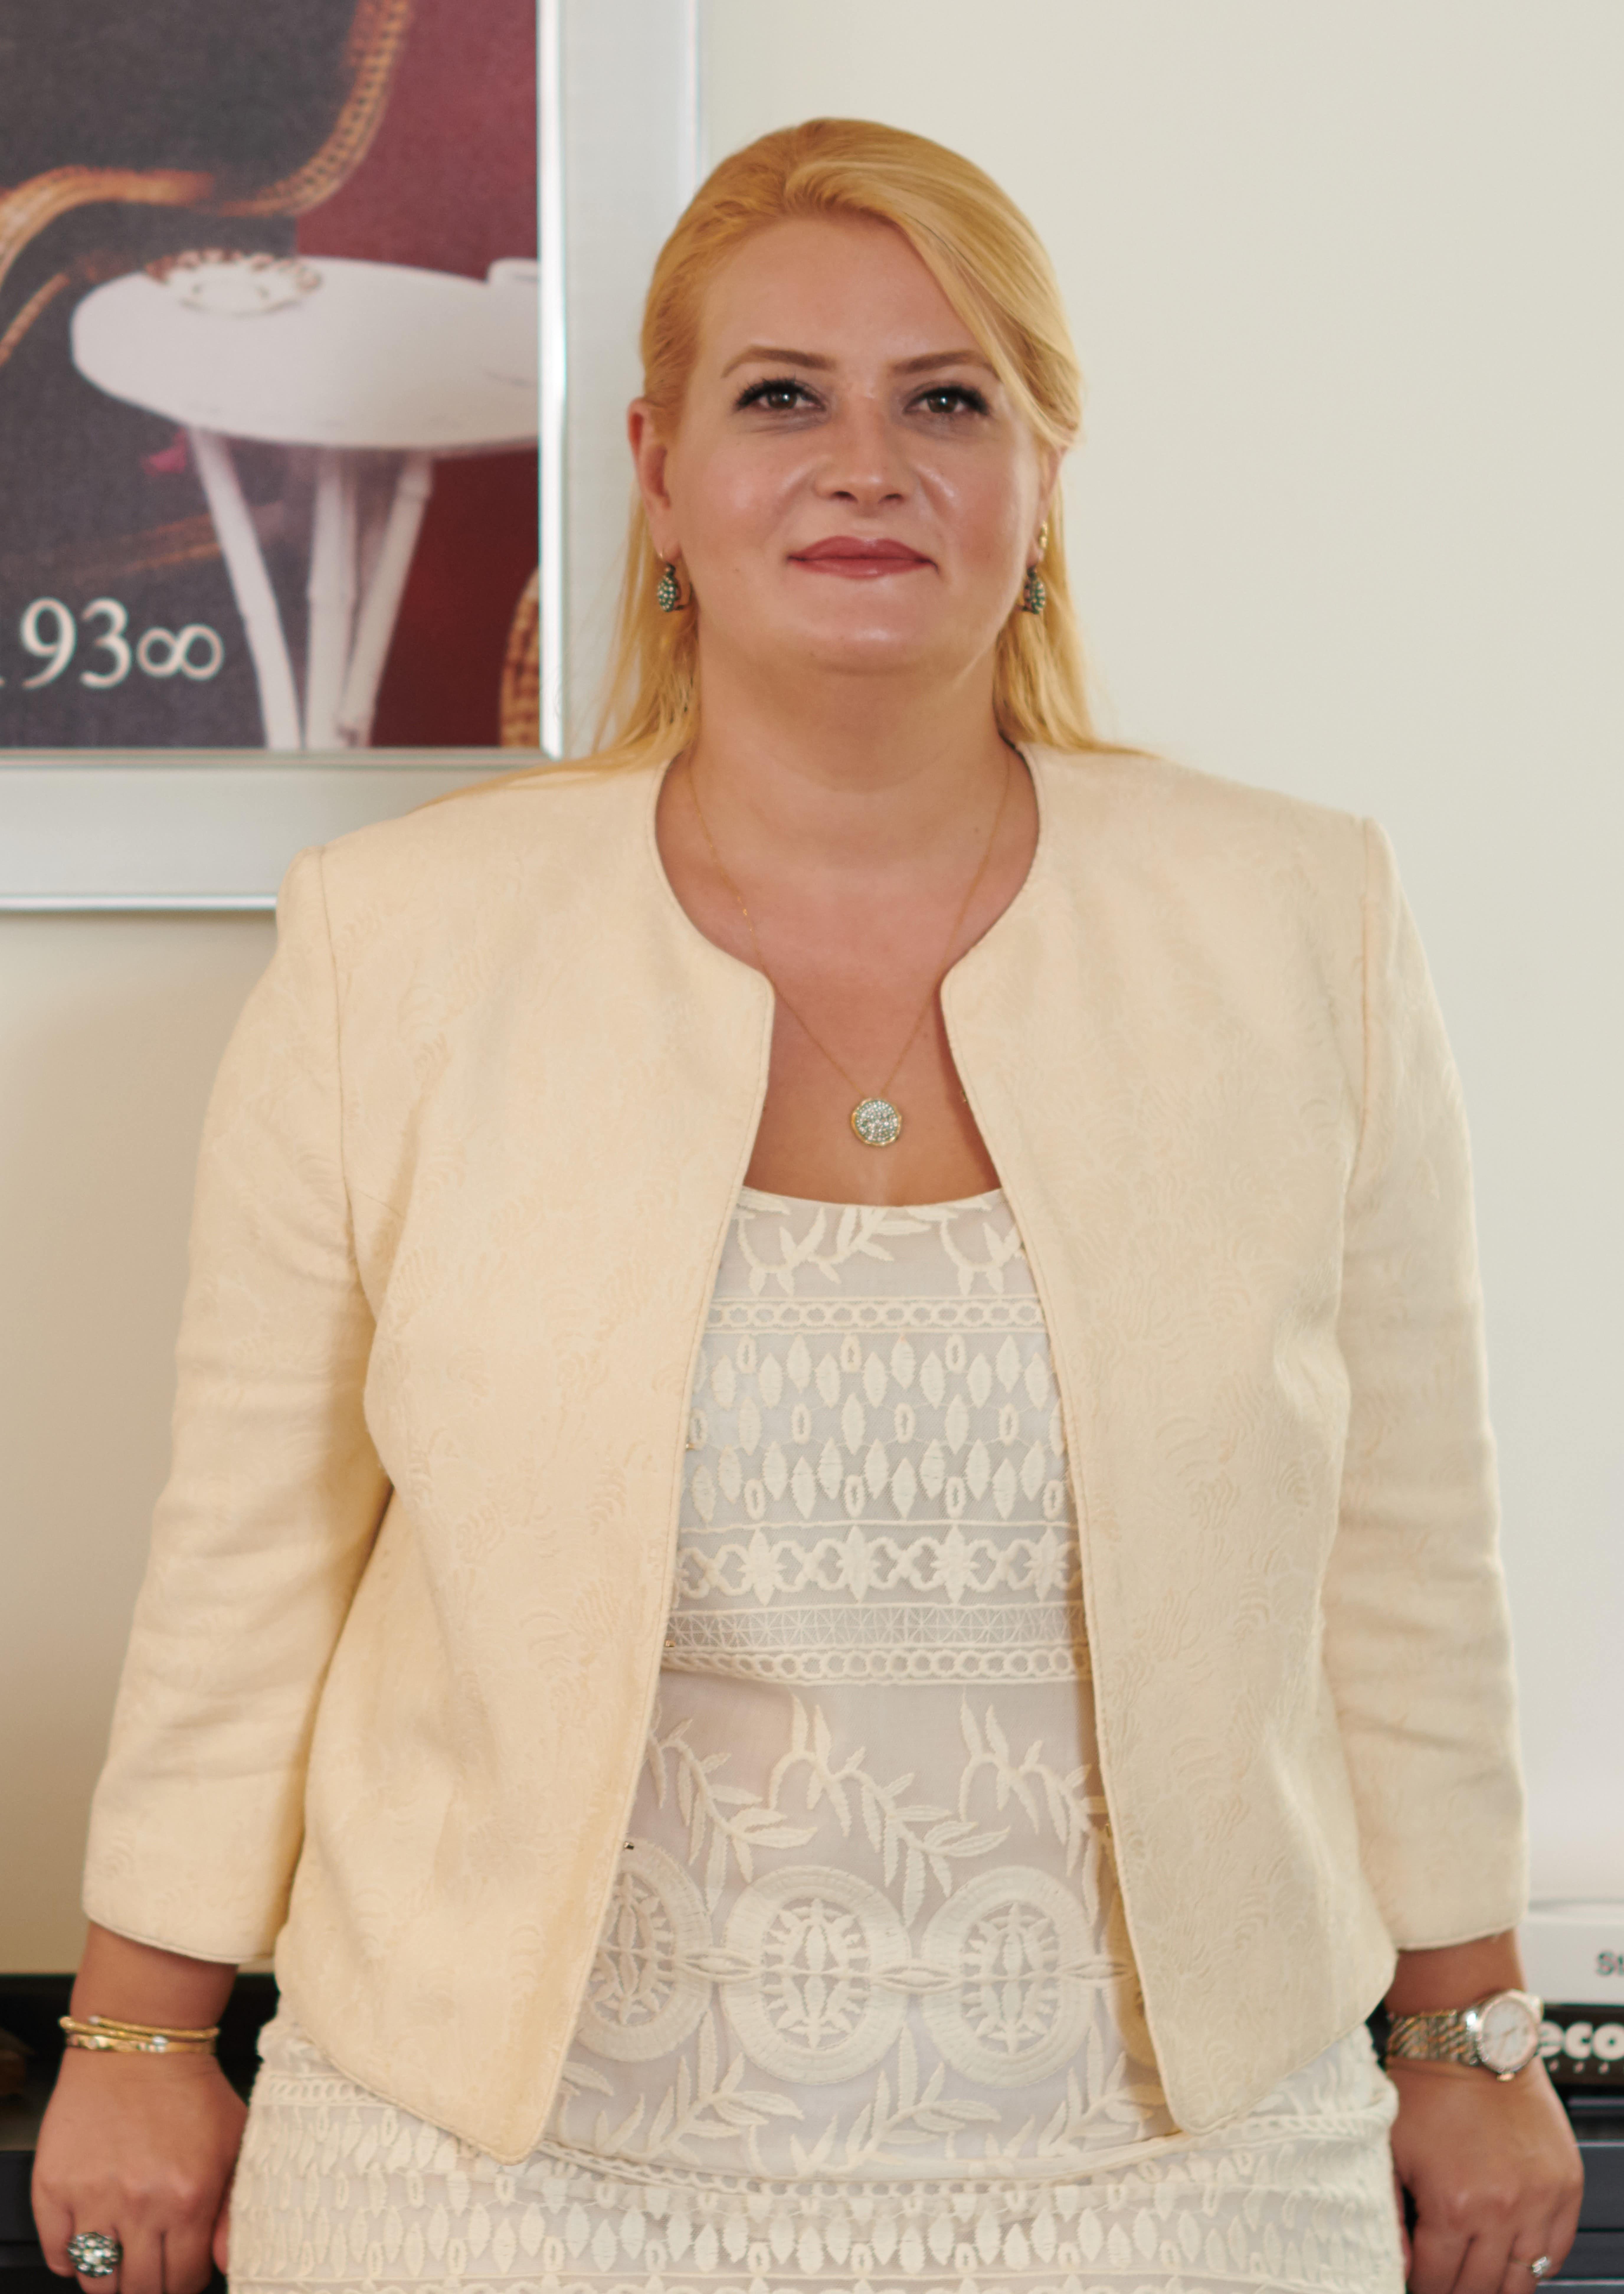 Serra Yilmaz